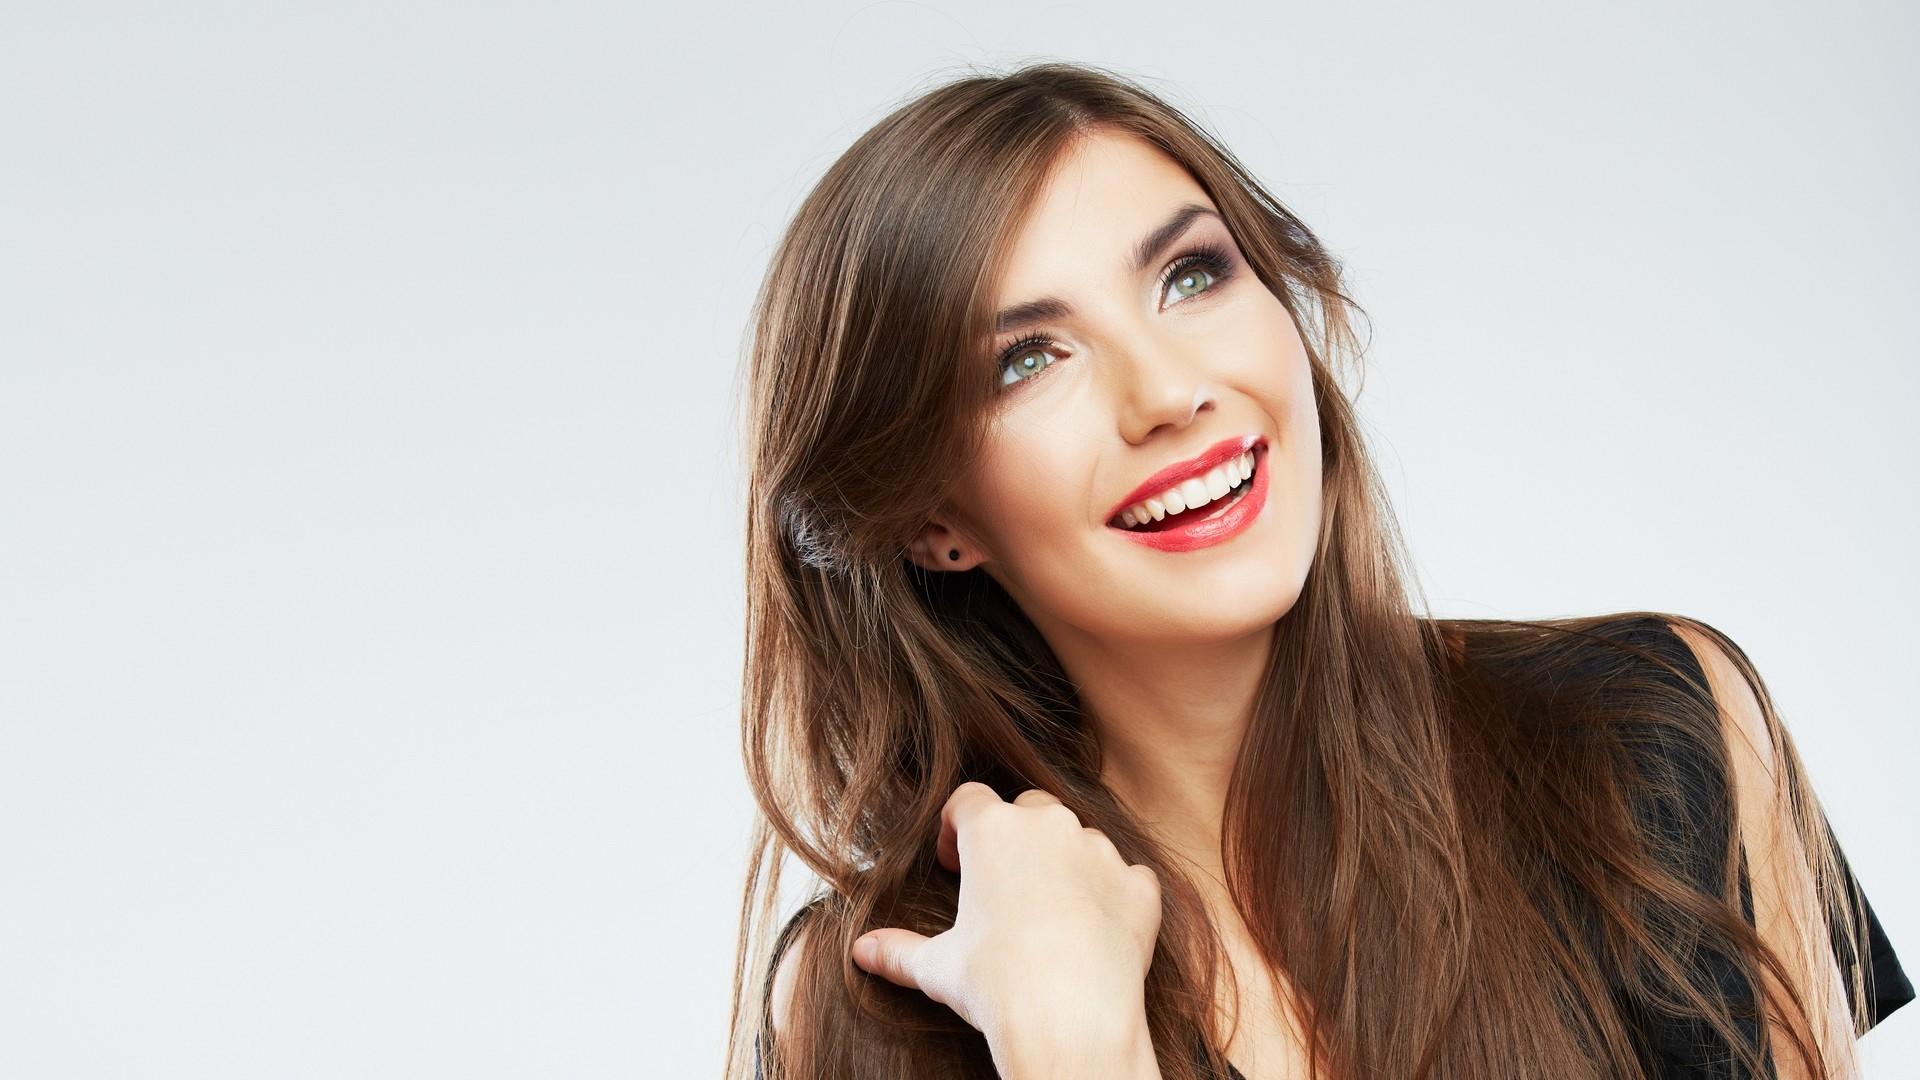 Smile girl photo